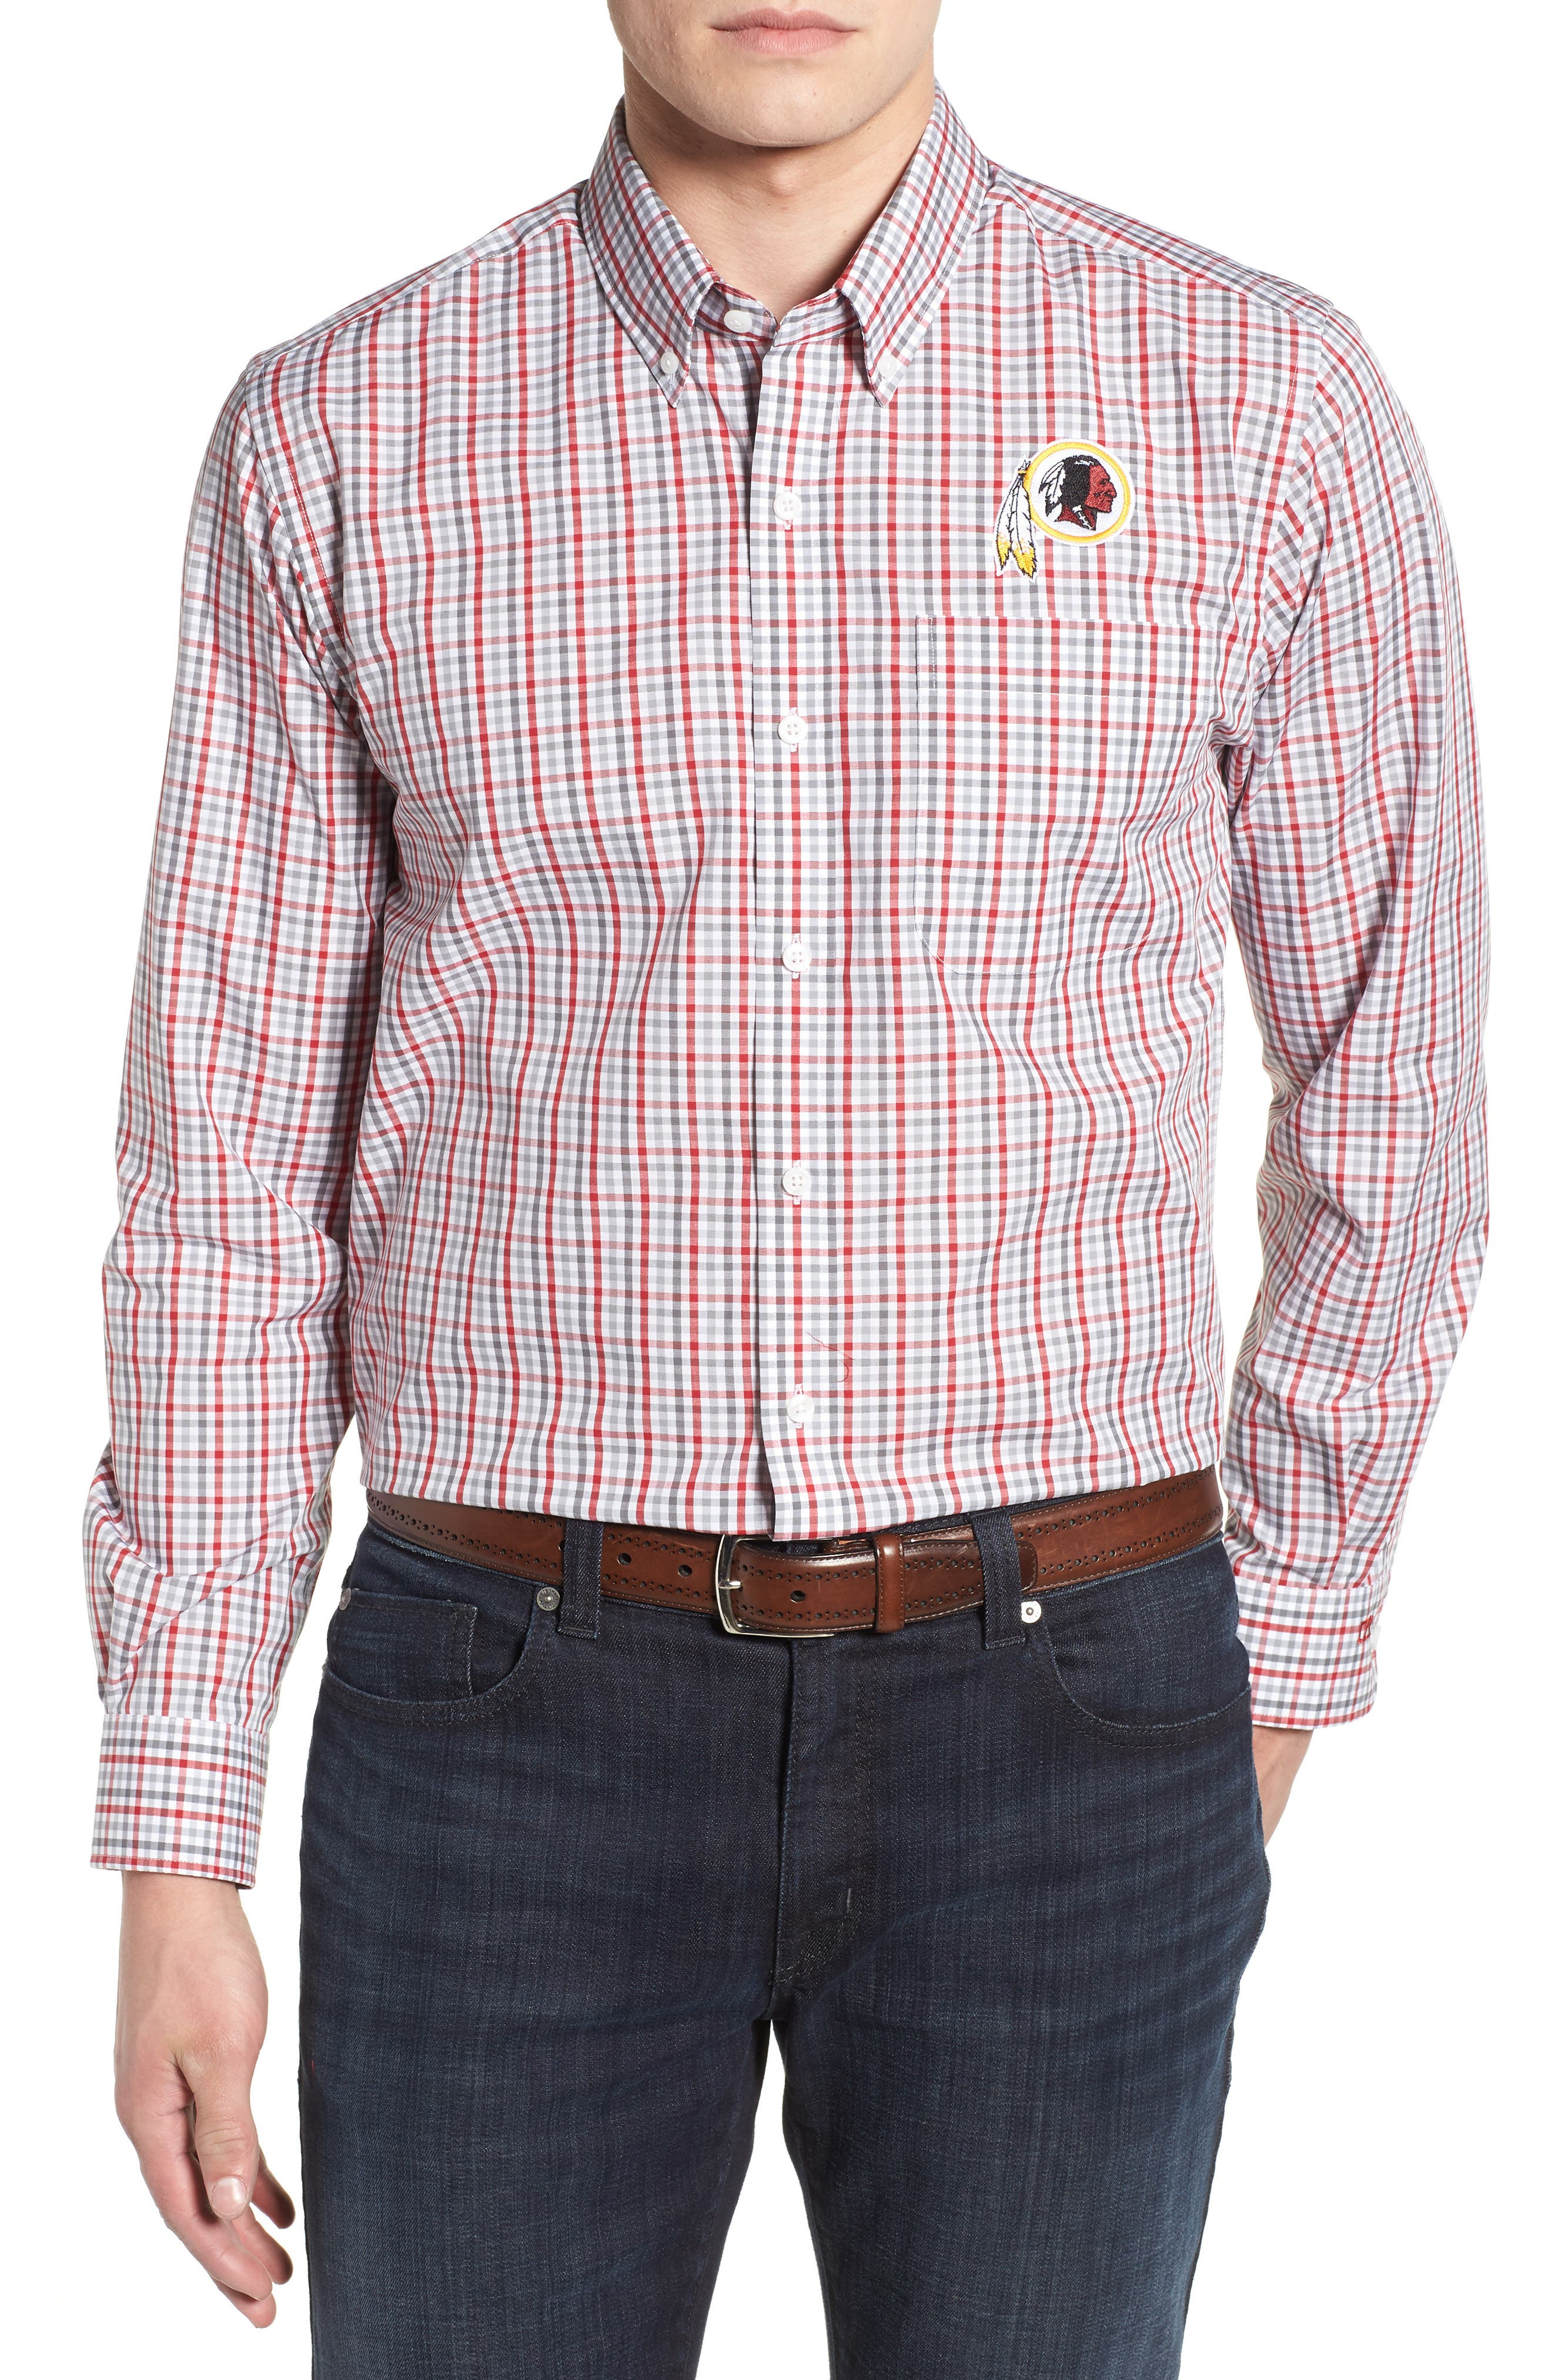 Washington - Gilman Regular Fit Plaid Sport Shirt,                             Main thumbnail 1, color,                             CARDINAL RED